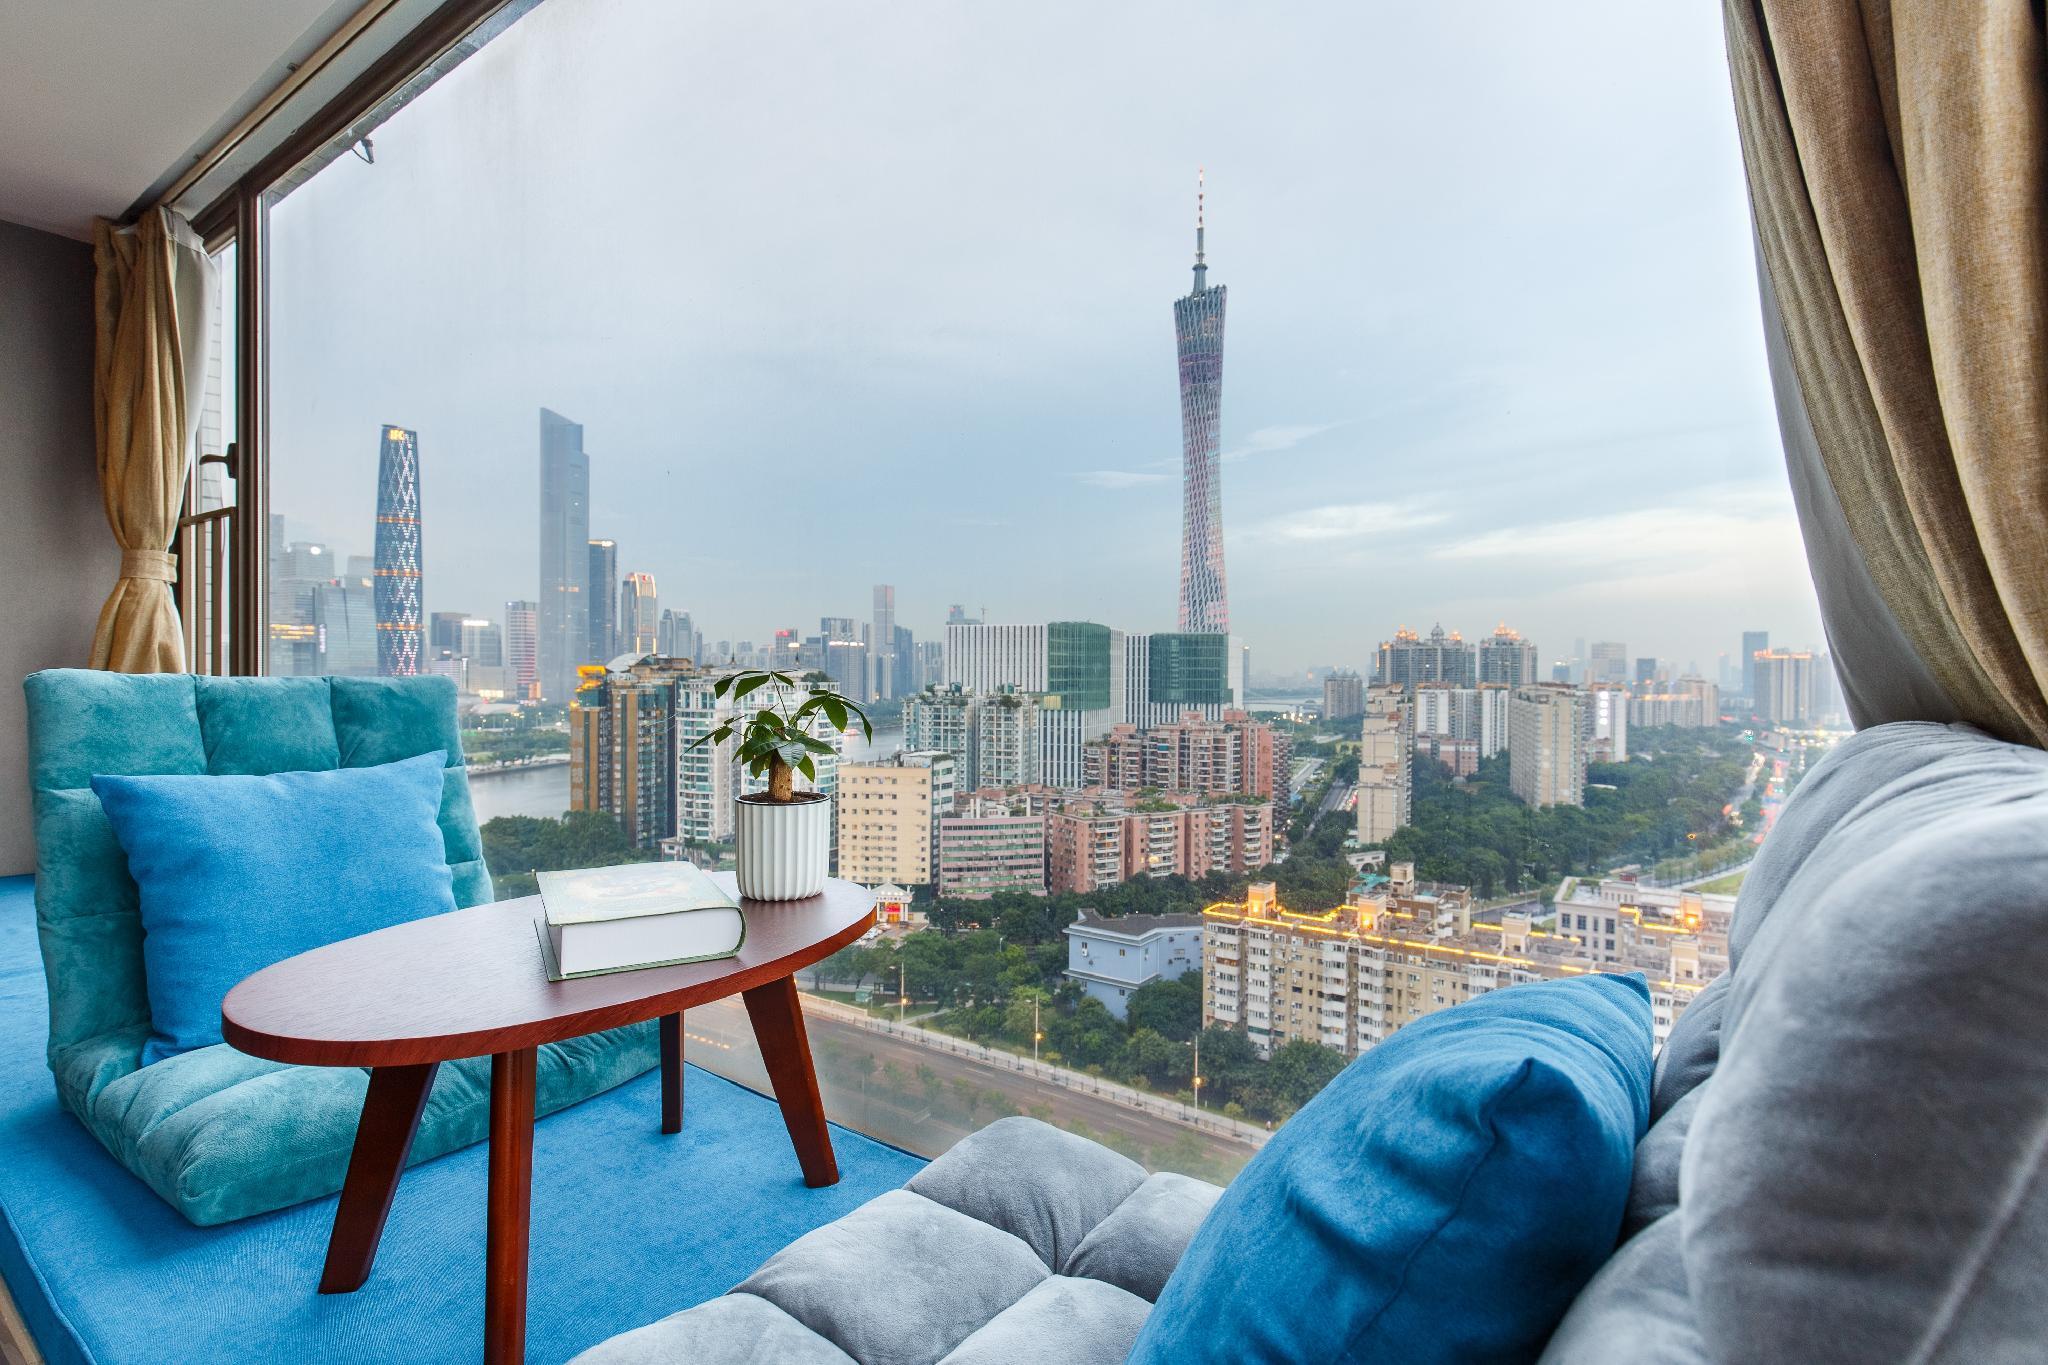 GuangzhouTower  High Rise City View  Canton Fair